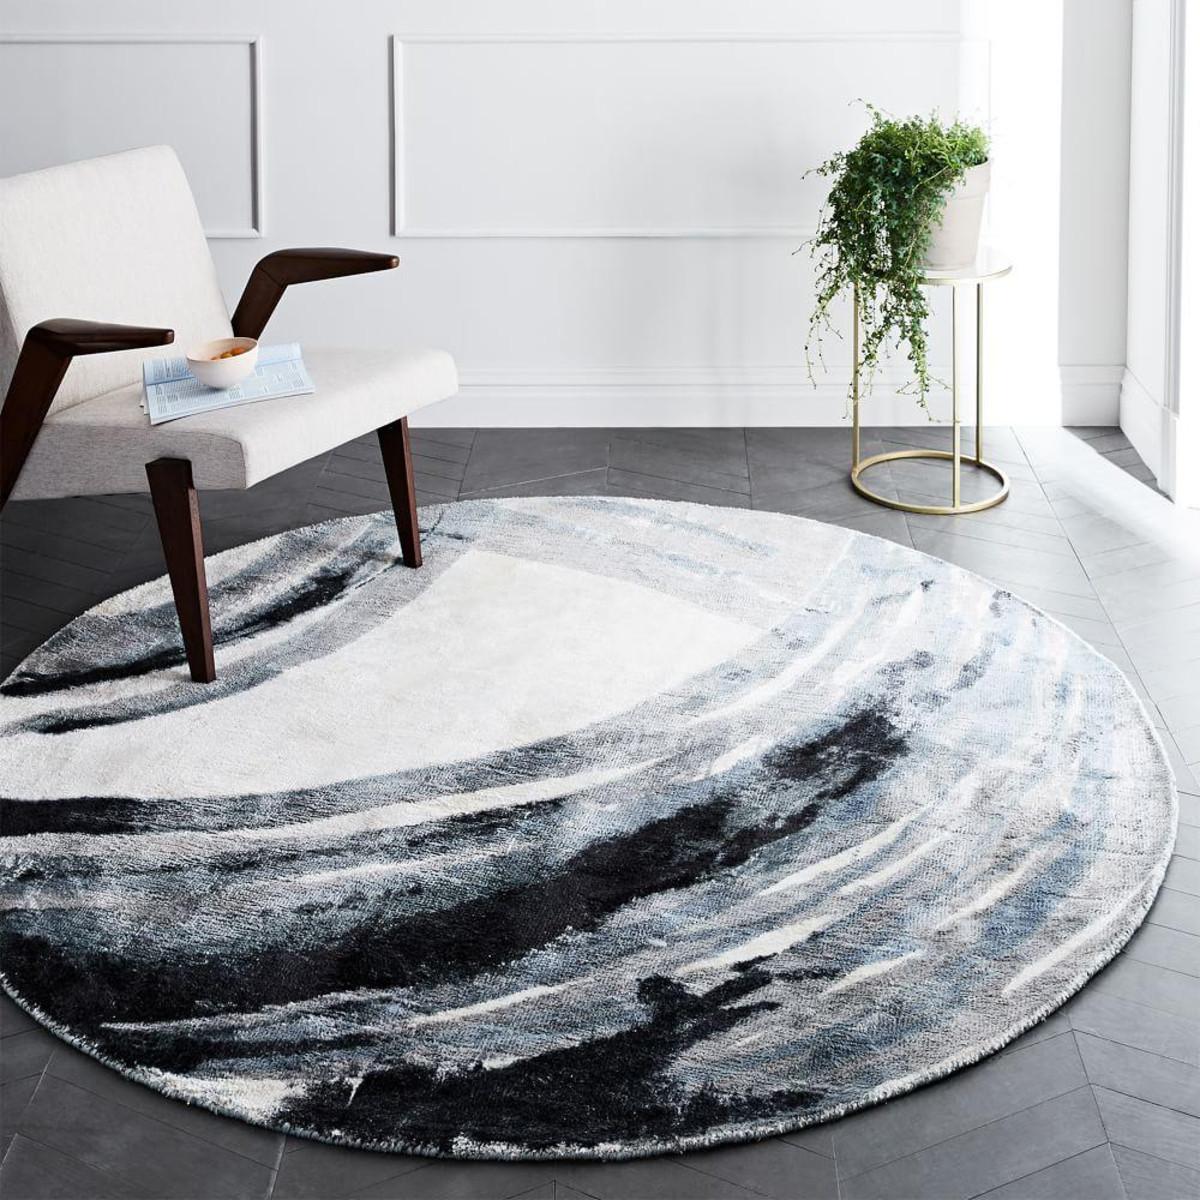 In the spotlight: West Elm – Floor rugs